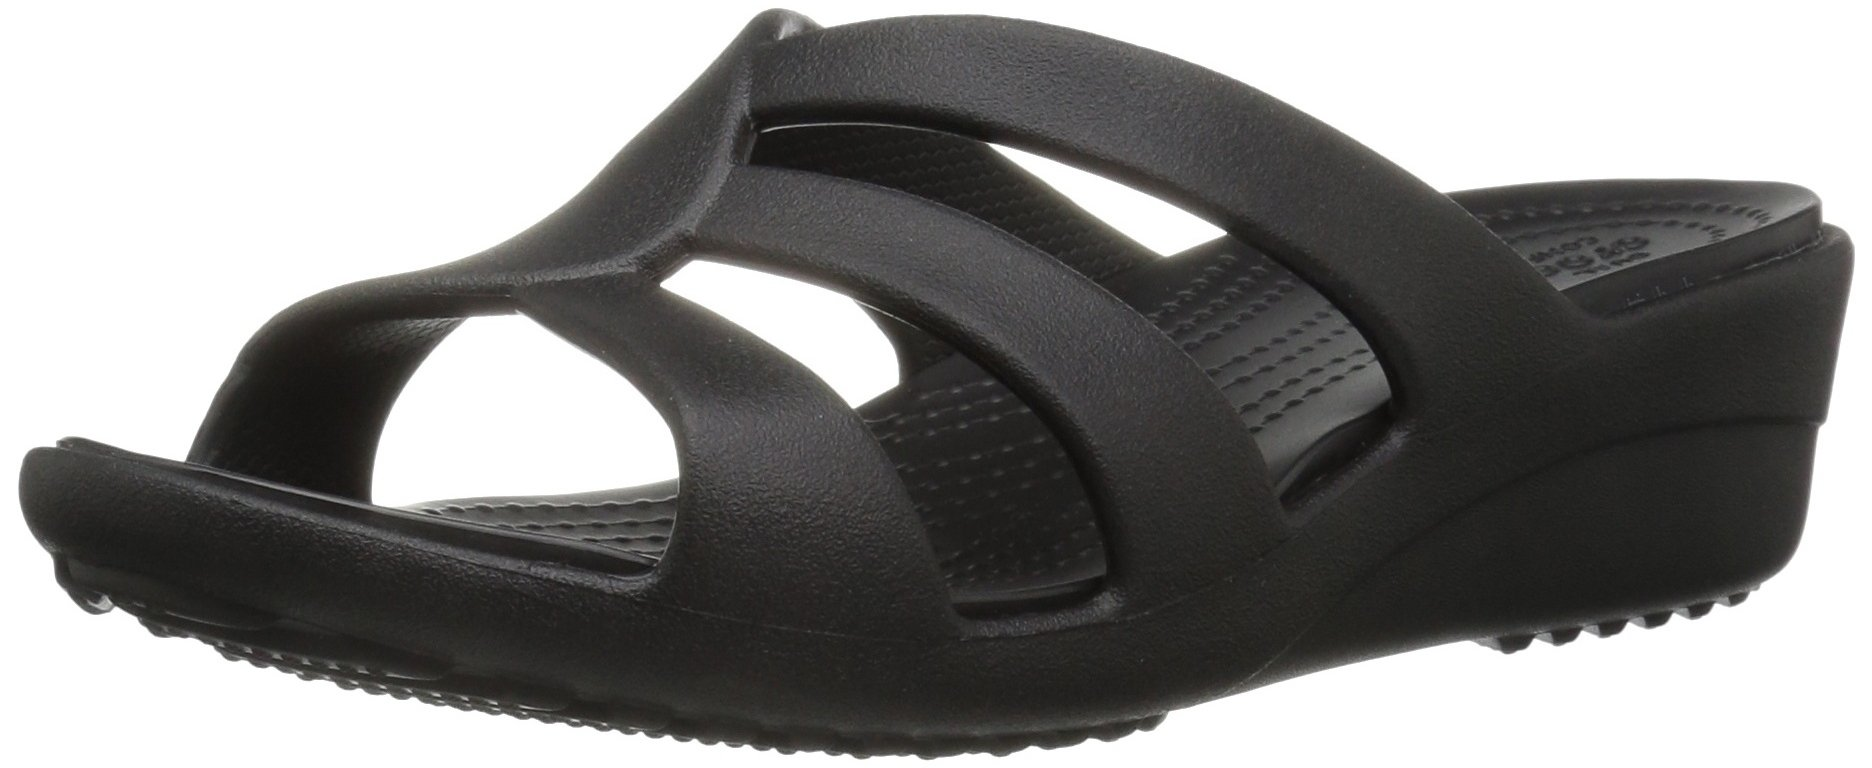 Crocs Women's Sanrah Strappy Wedge Sandal, Black, 6 M US